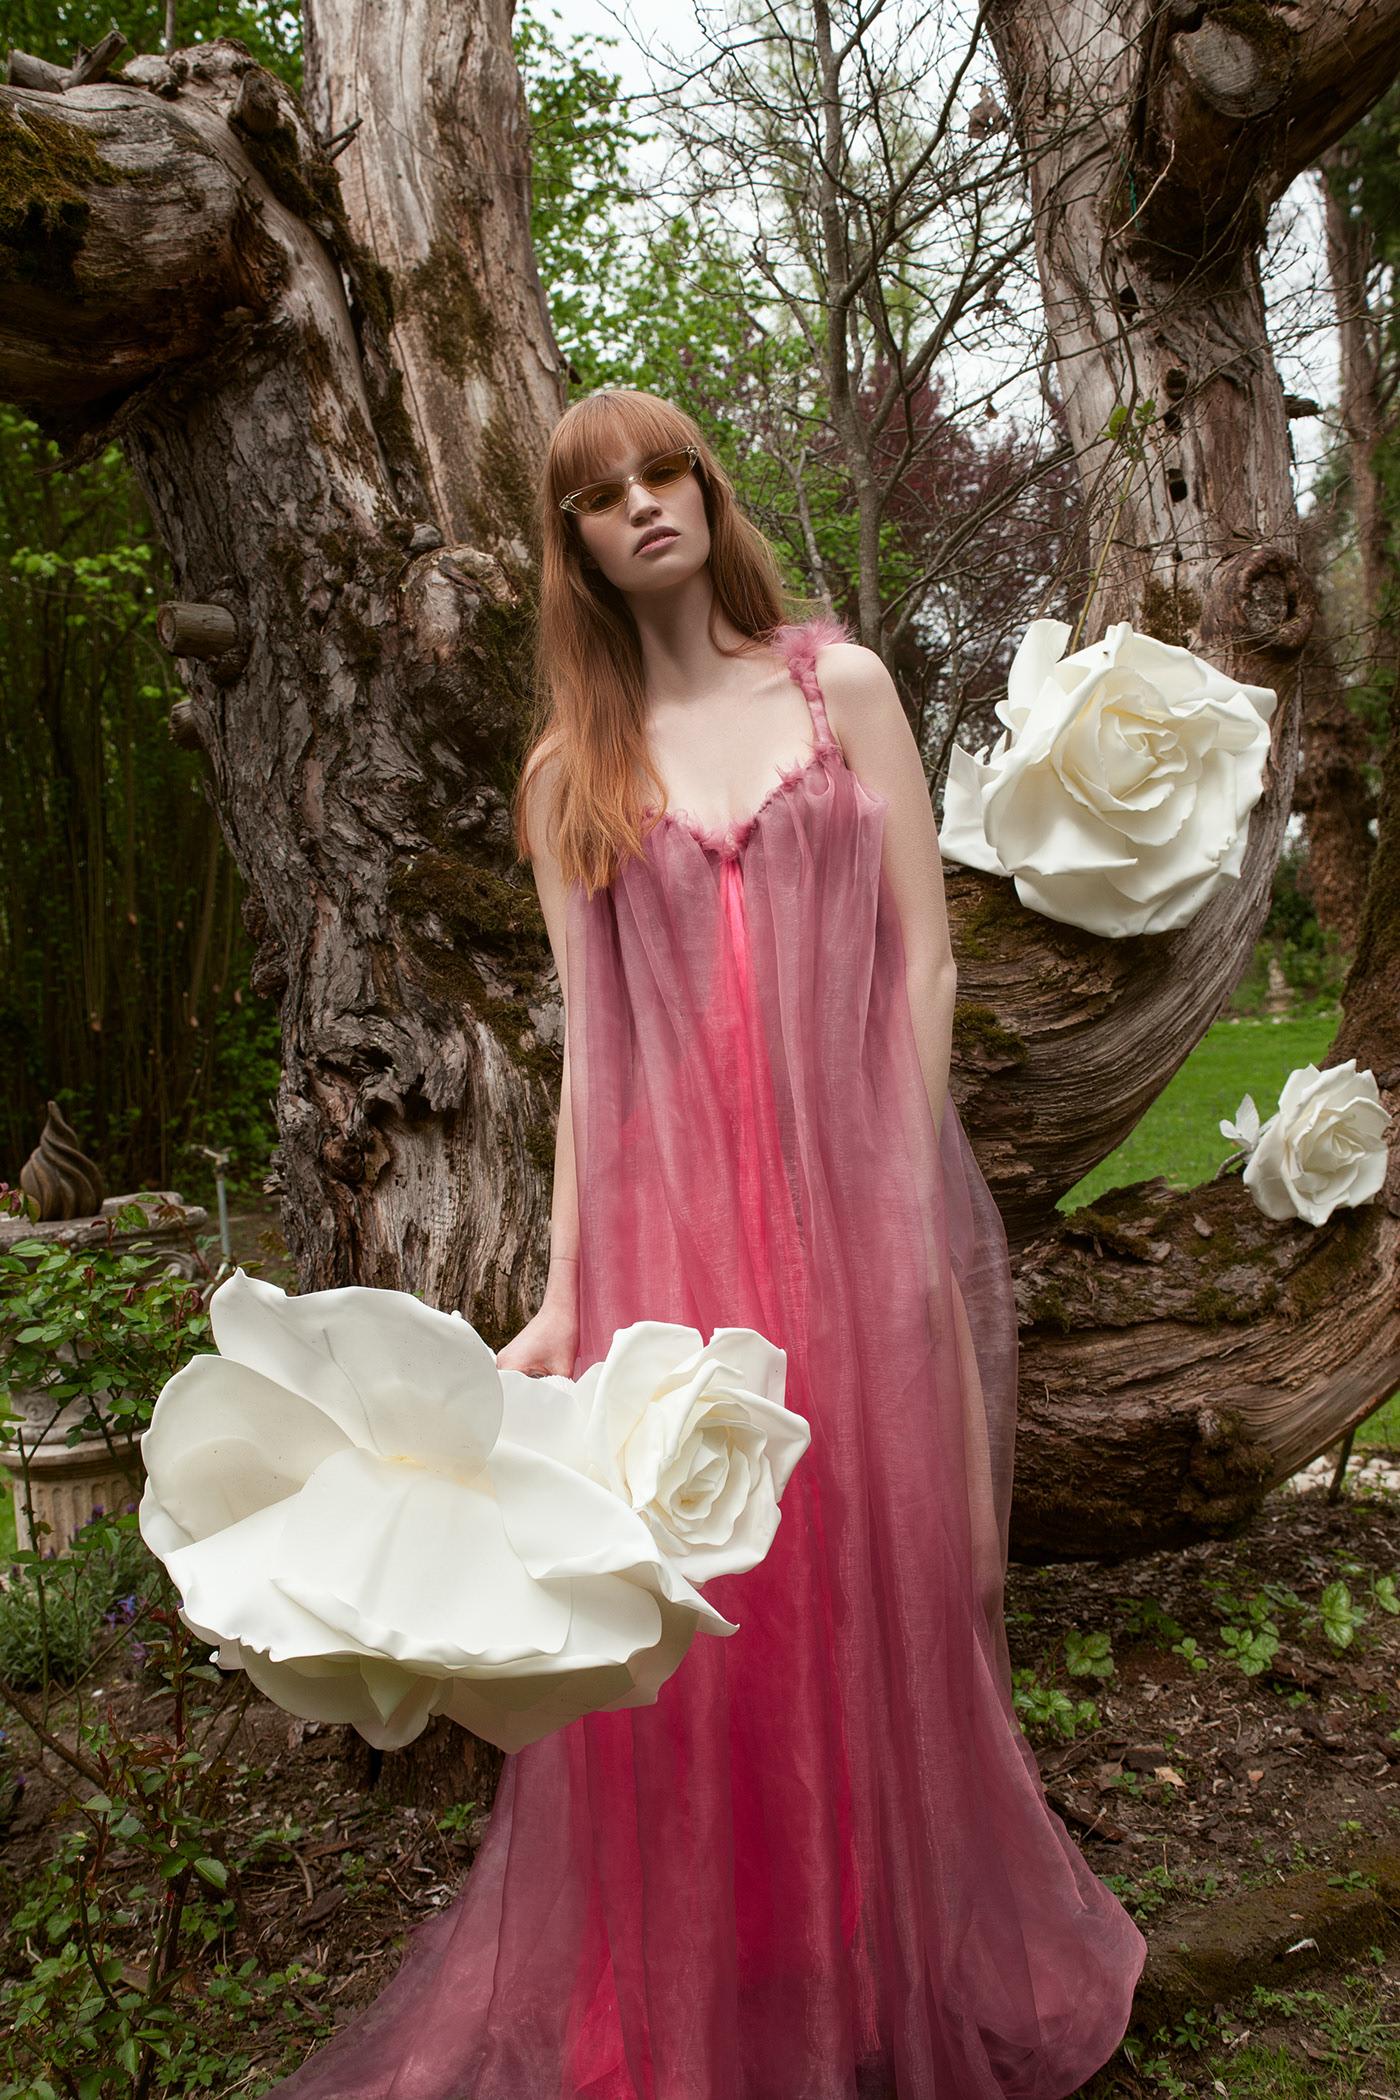 GRAZIA MAGAZINE / Photographer Stella Bonasoni - Model Luisa Bianchin